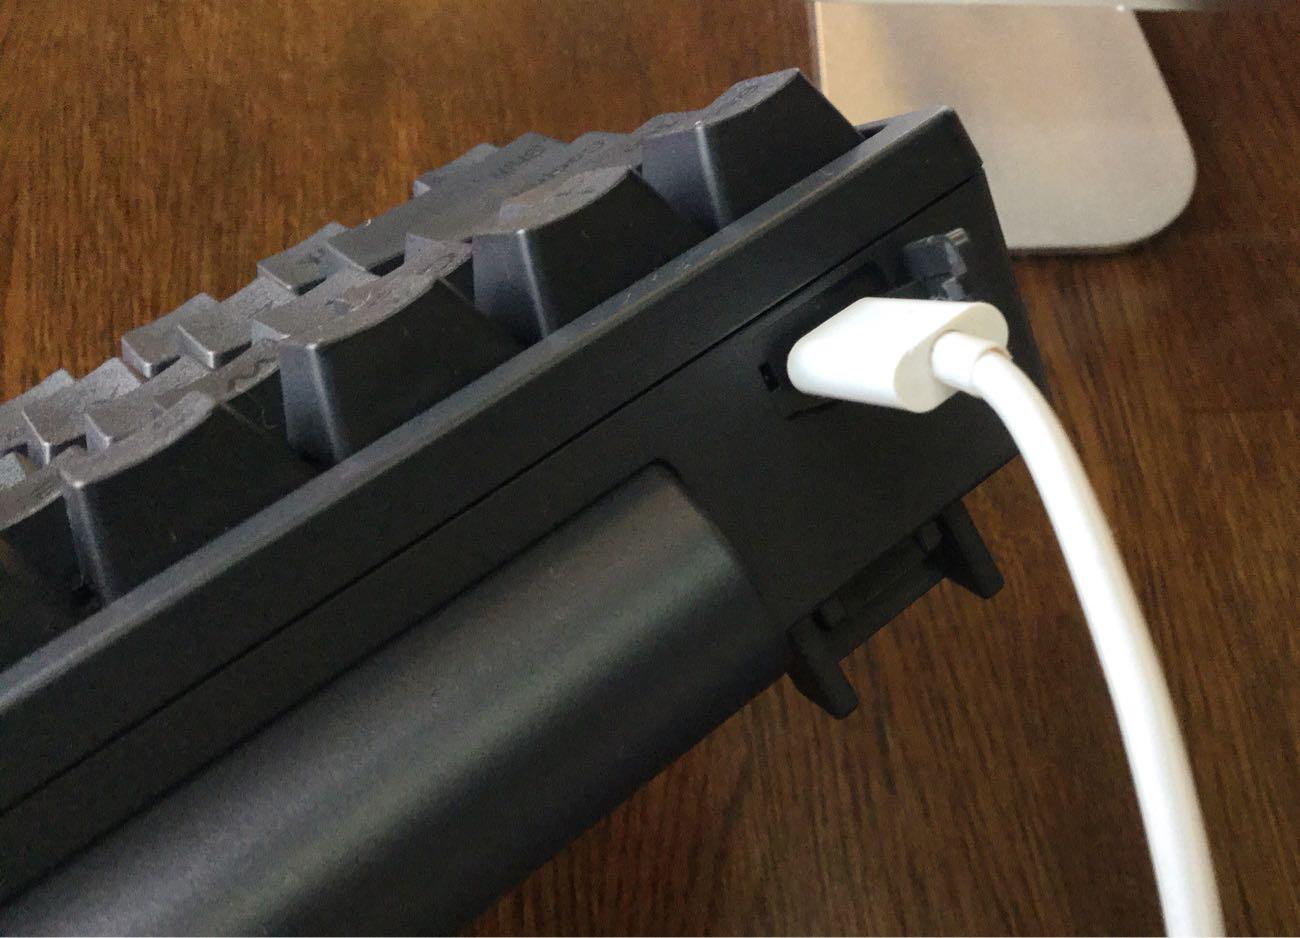 USB micro-Bコネクタがあれば電池が切れてもオッケー